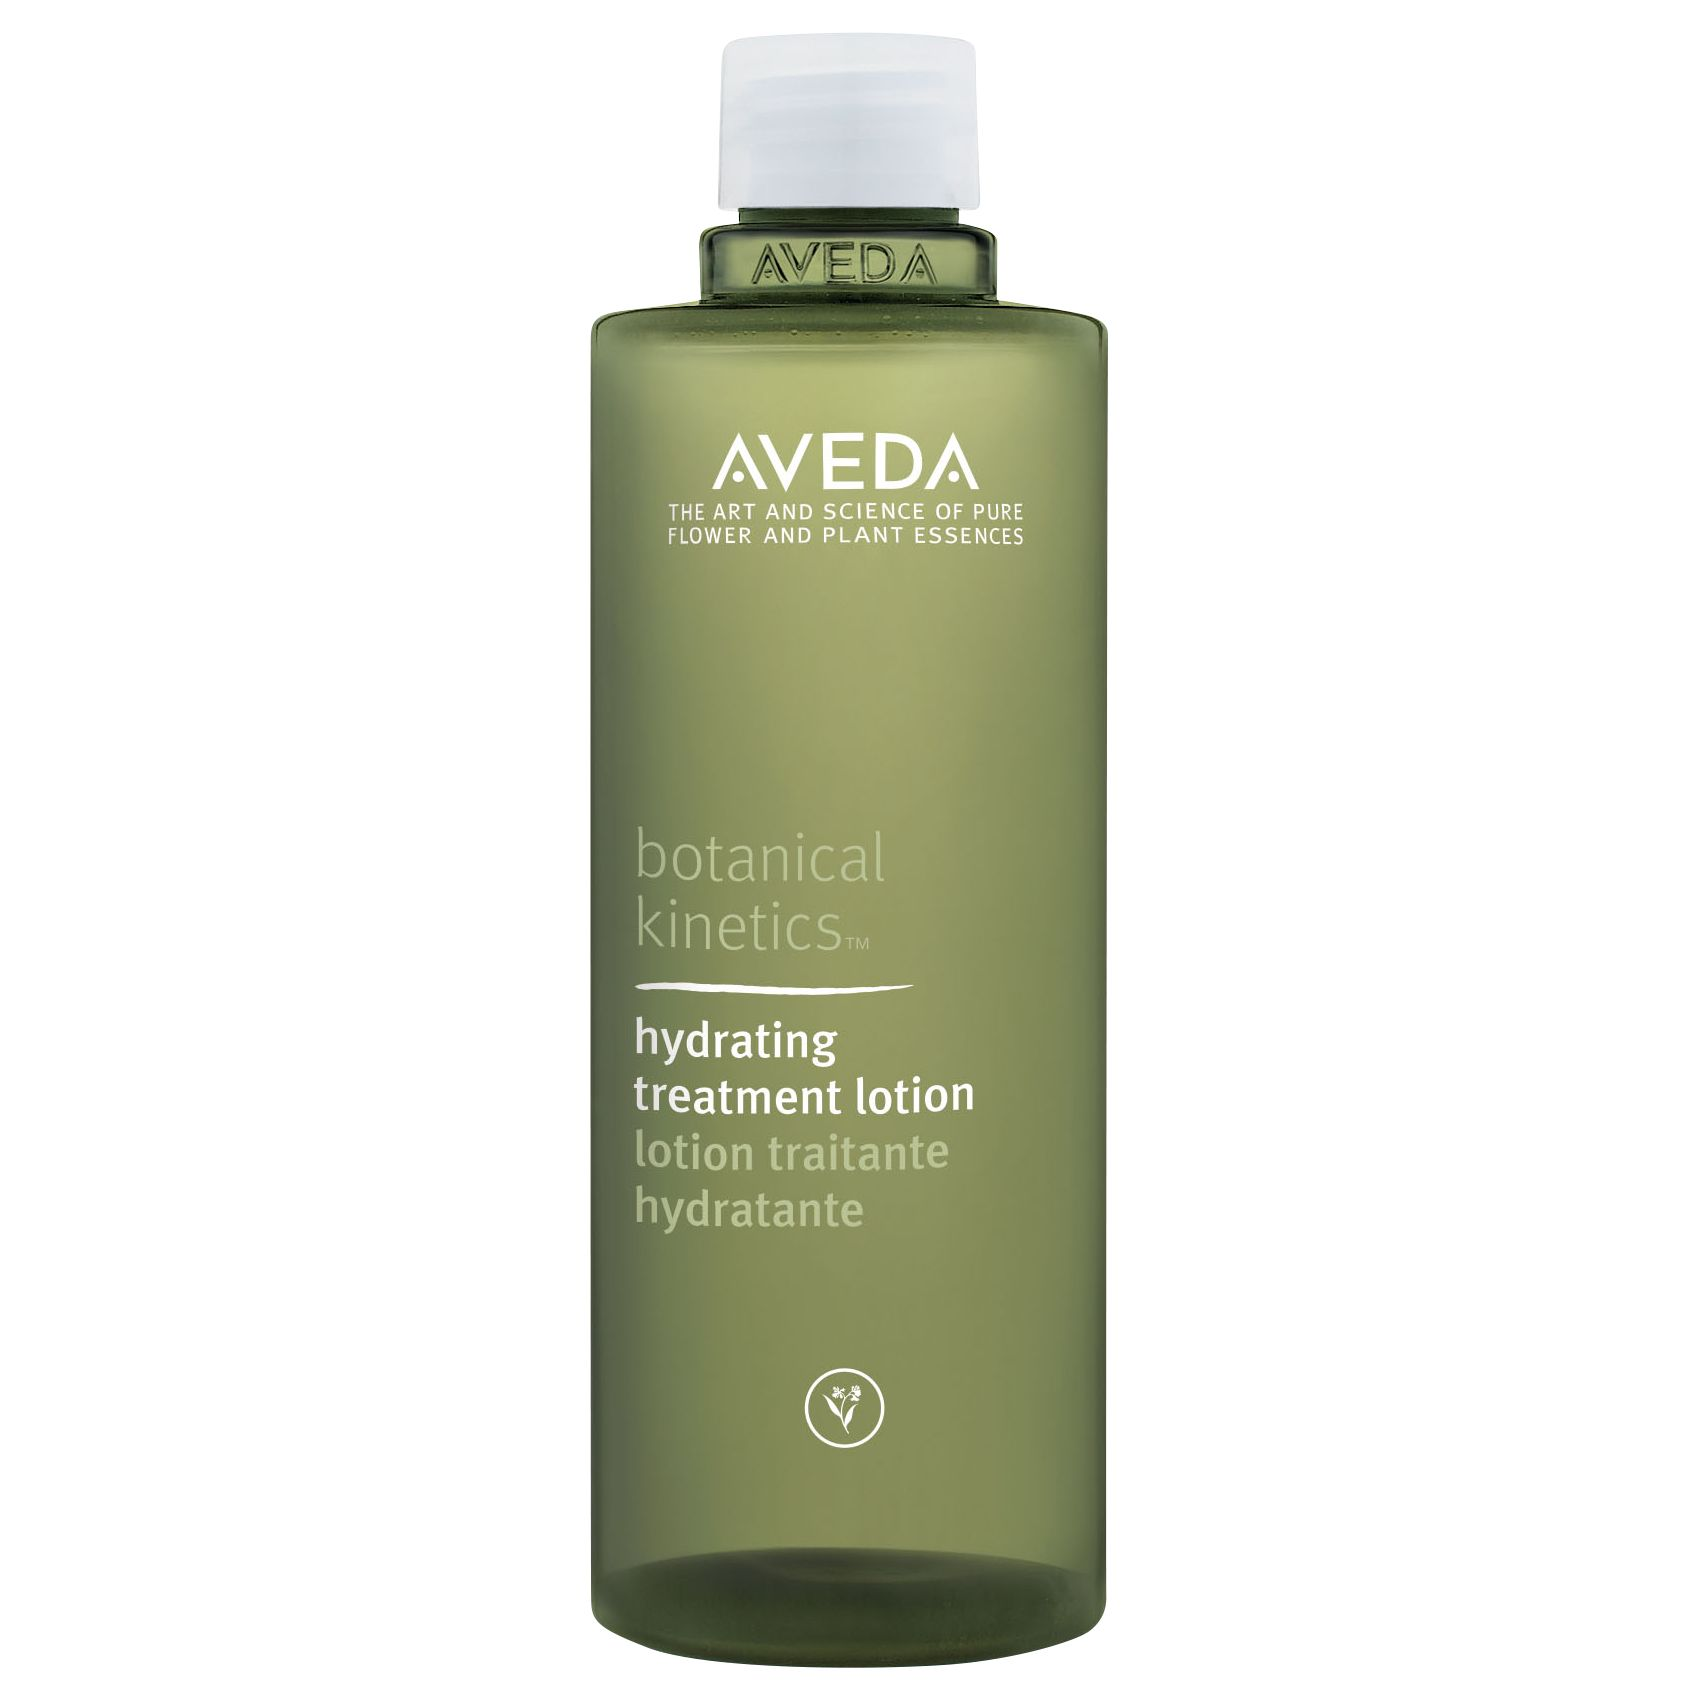 AVEDA AVEDA Botanical Kinetics™ Hydrating Treatment Lotion, 150ml